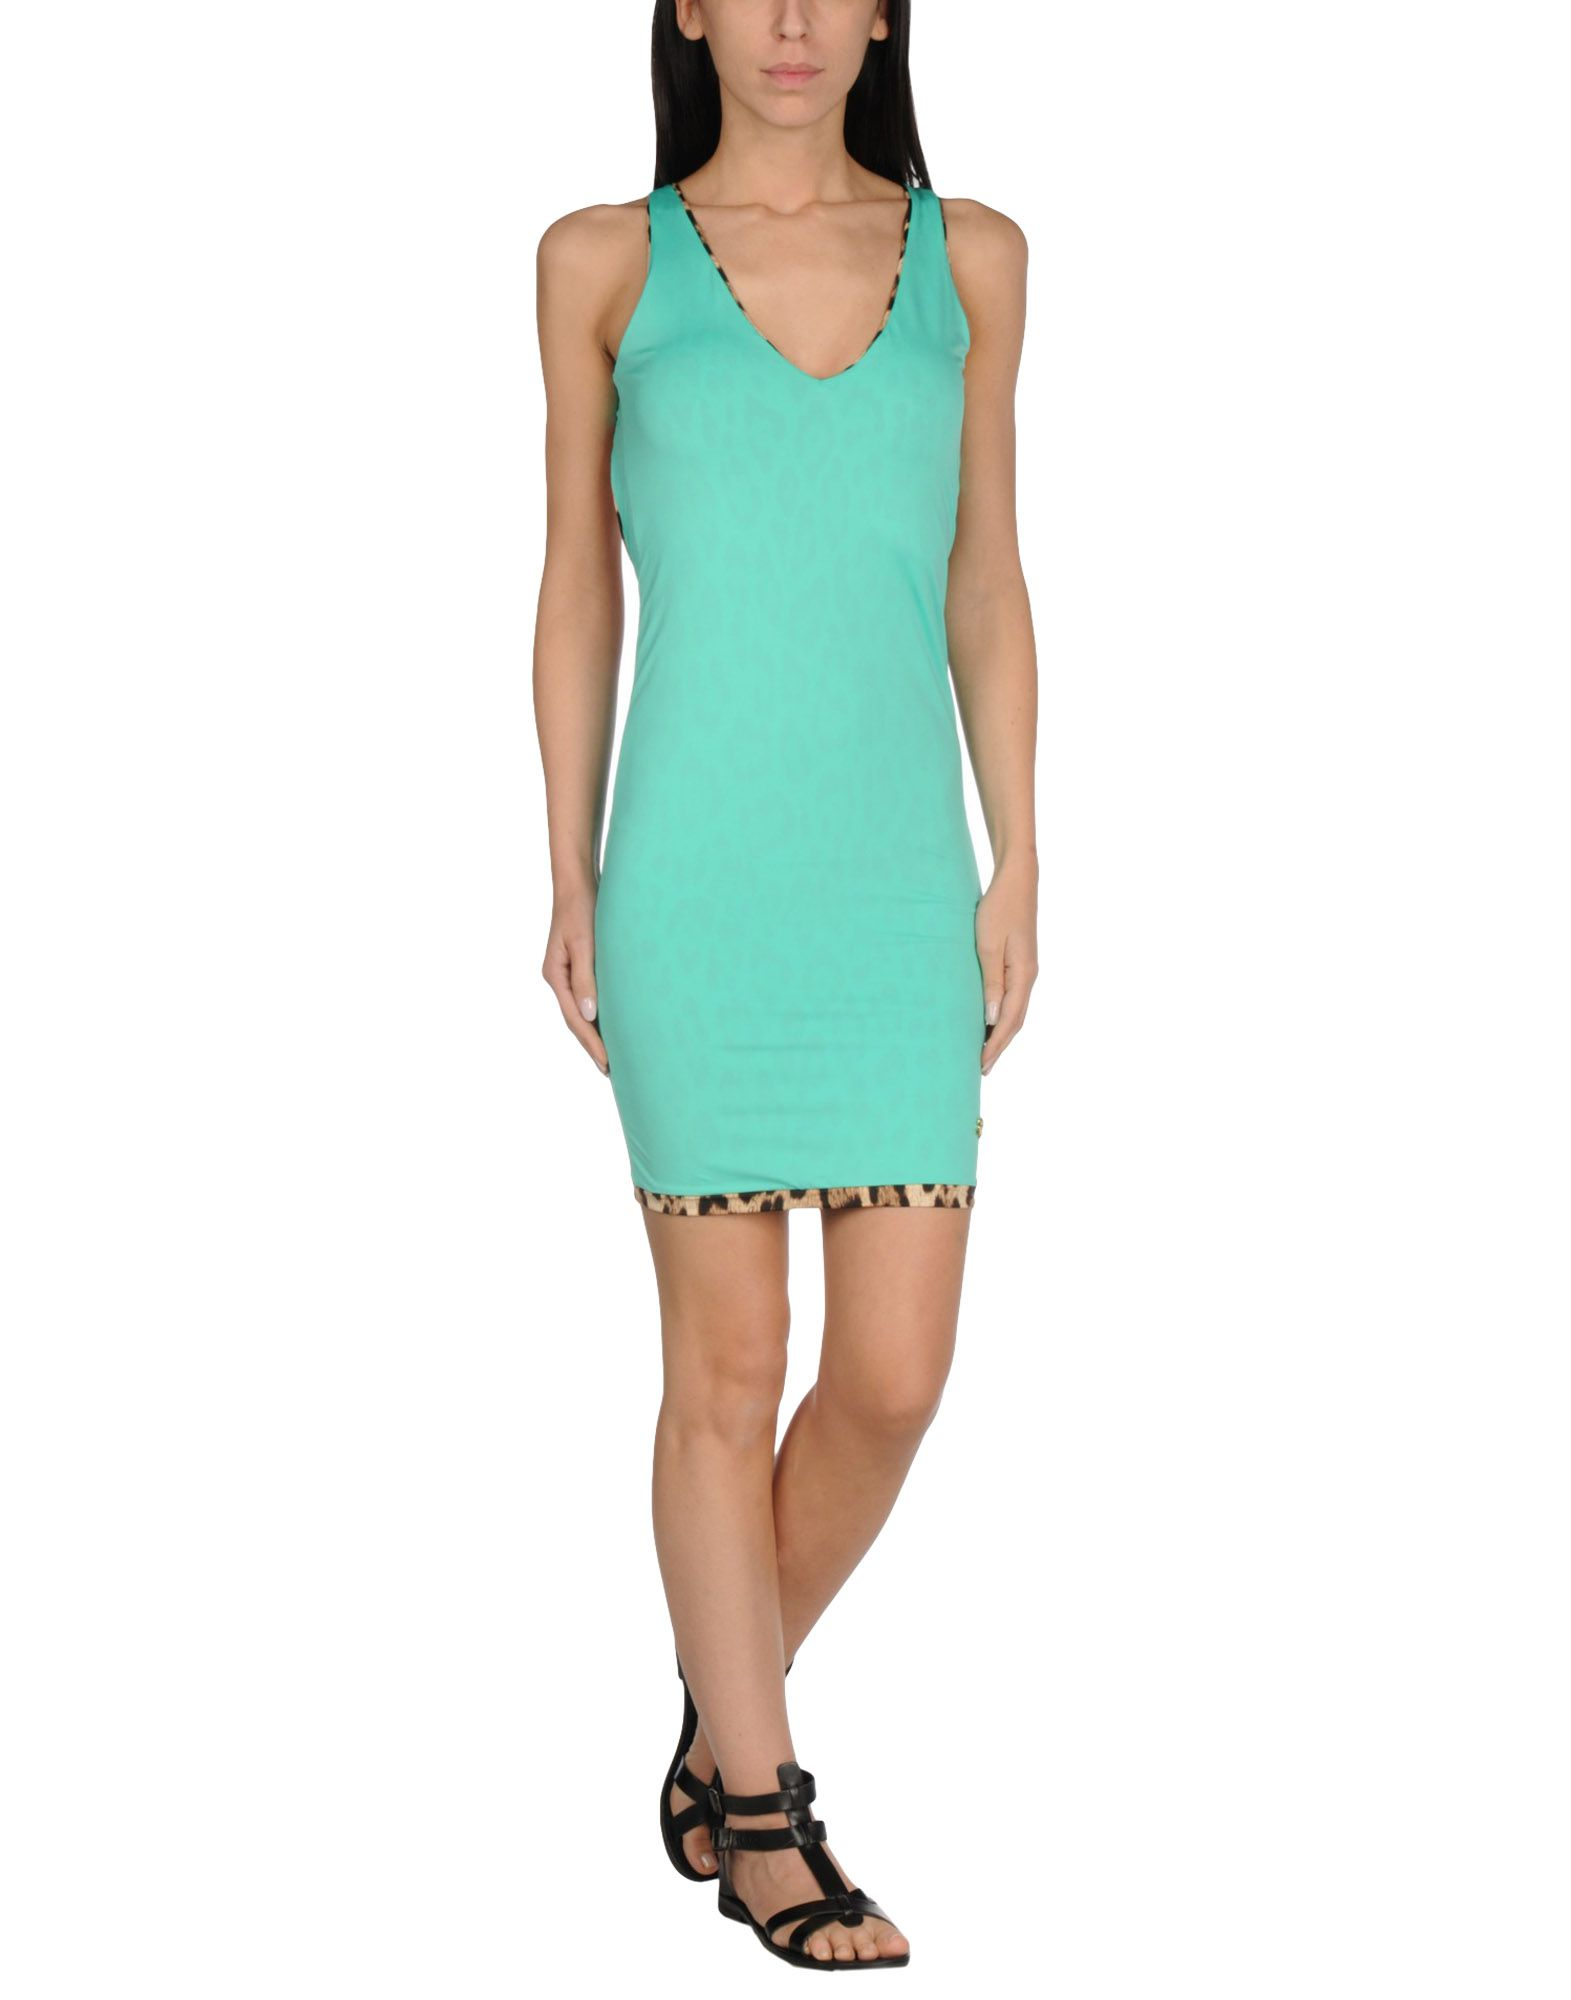 ROBERTO CAVALLI Пляжное платье платье пляжное deseo платье пляжное